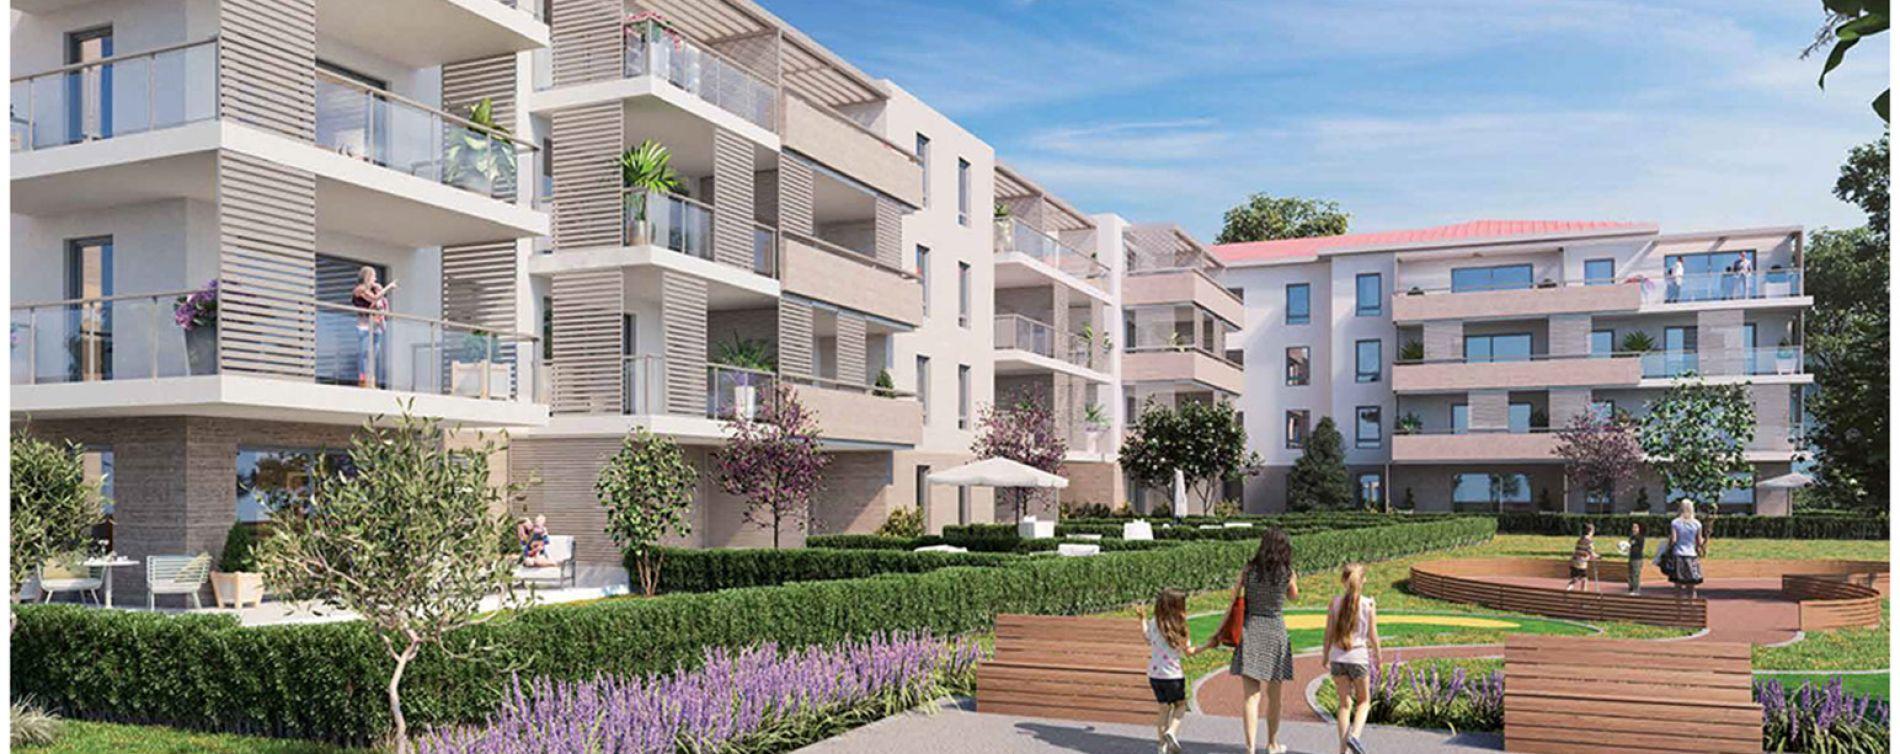 Fréjus : programme immobilier neuve « Primavera » (2)